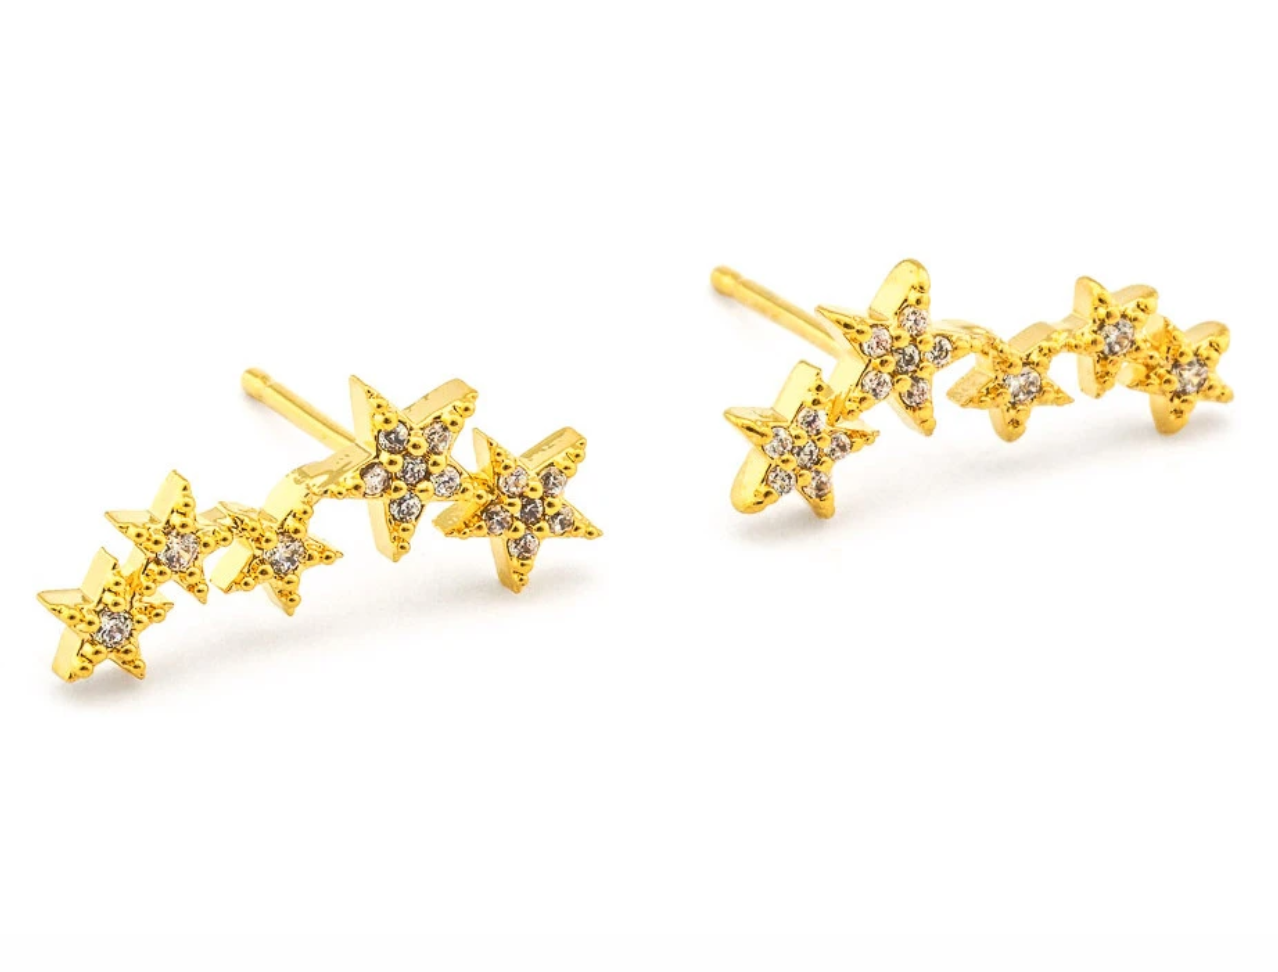 tai Gold CZ 5 star stud earrings